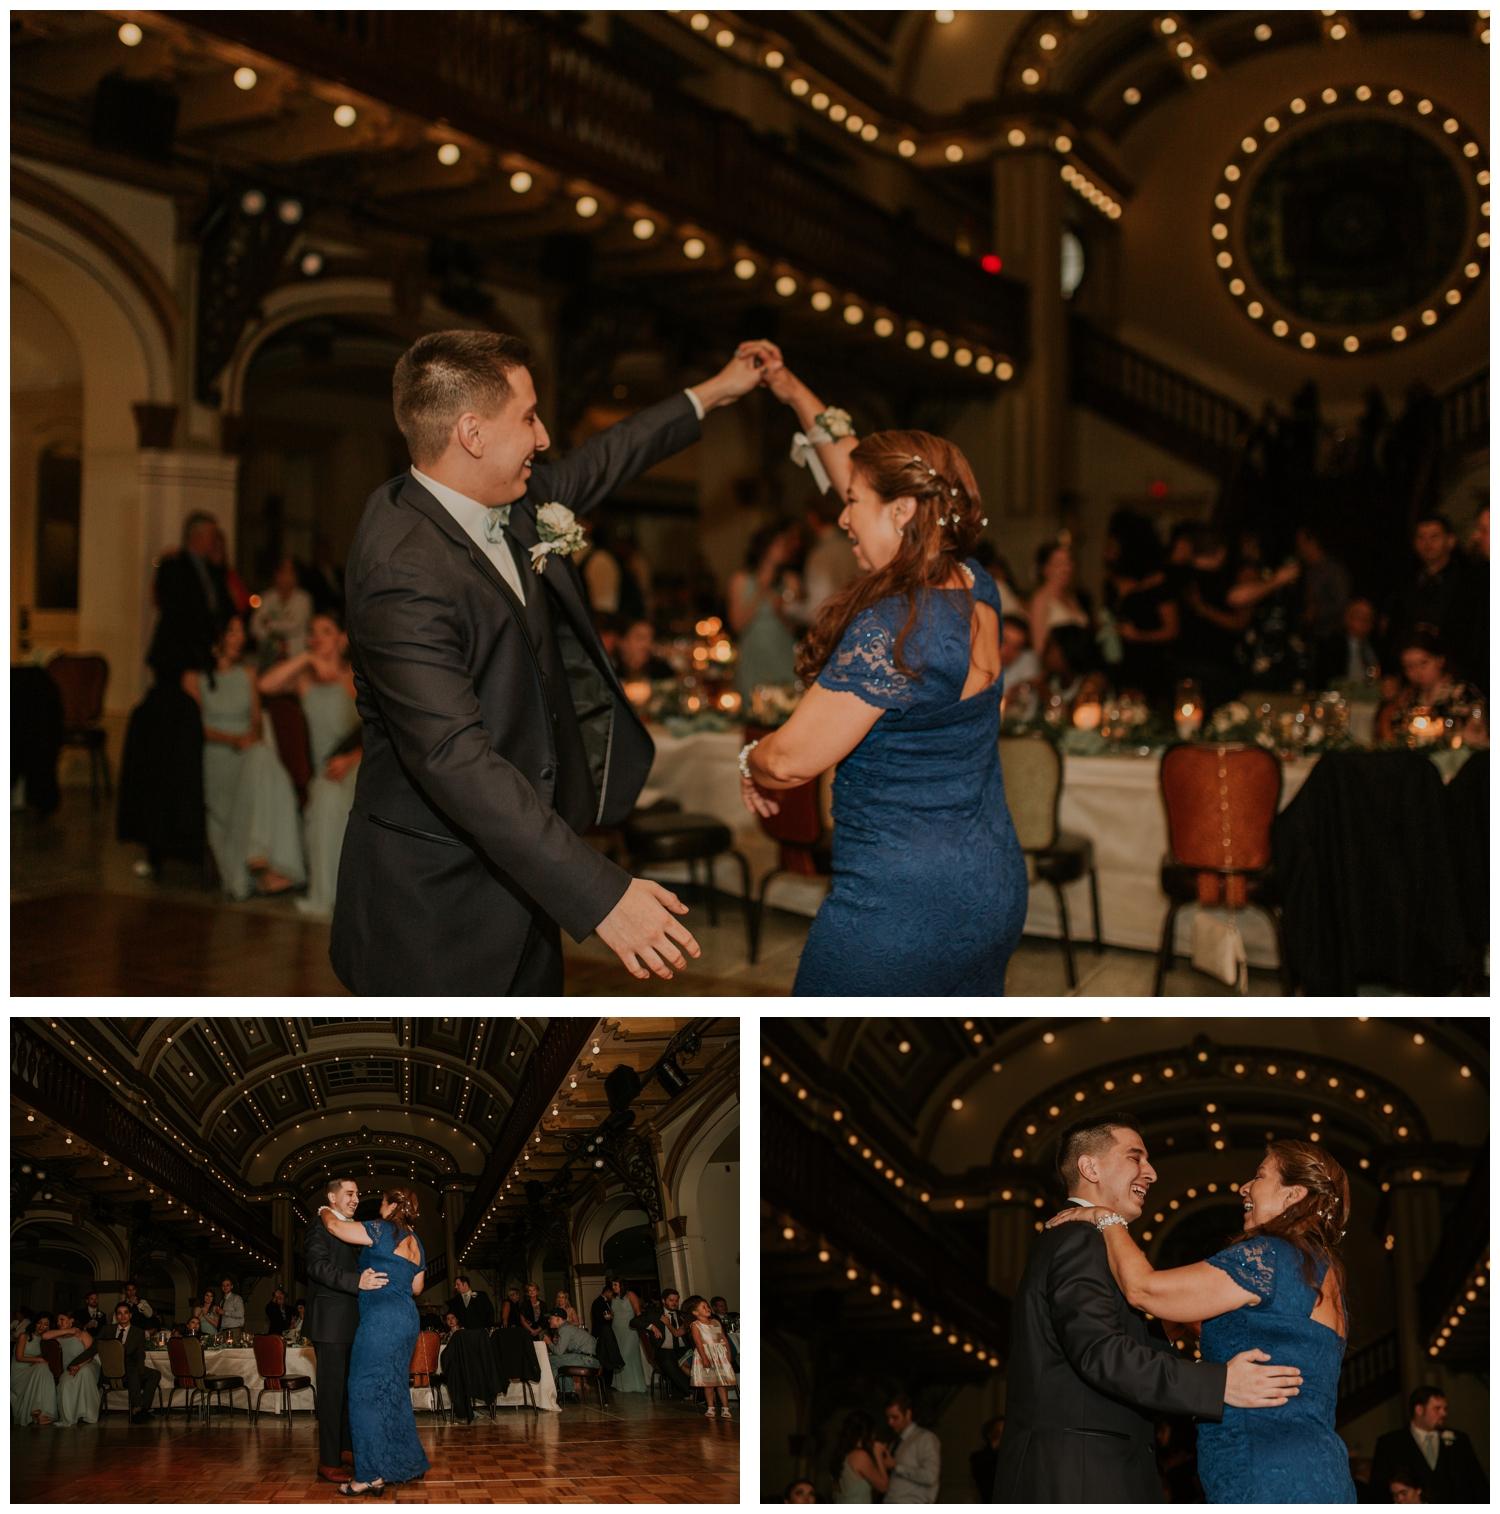 Jenna+Brandon, Mission Concepcion Wedding, San Antonio, Contista Productions Wedding Photography_0107.jpg